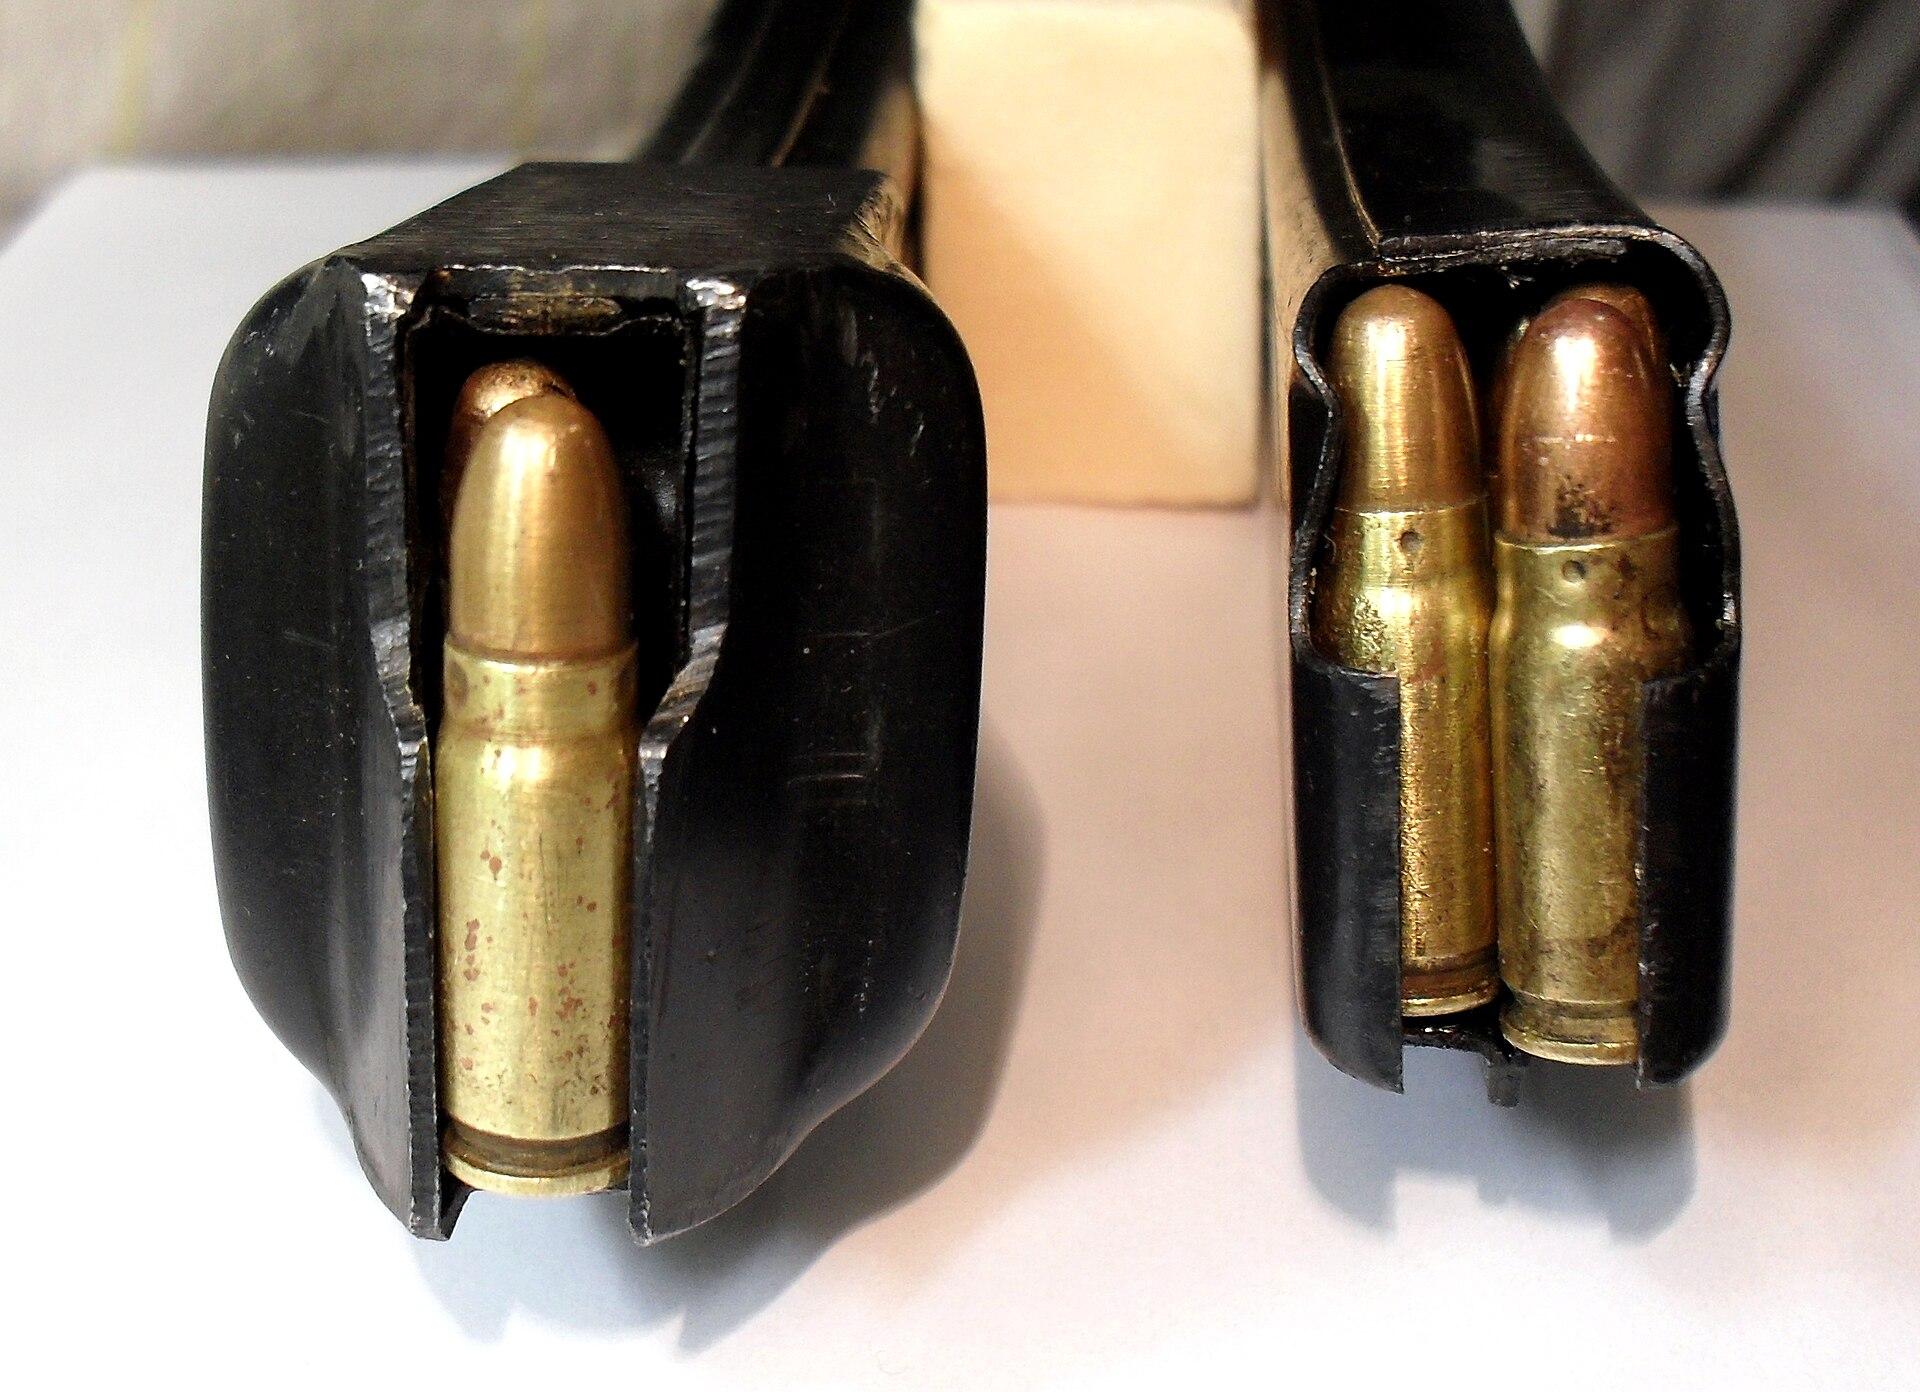 Thompson Gun For Sale >> PPSh-41 - Wikipedia